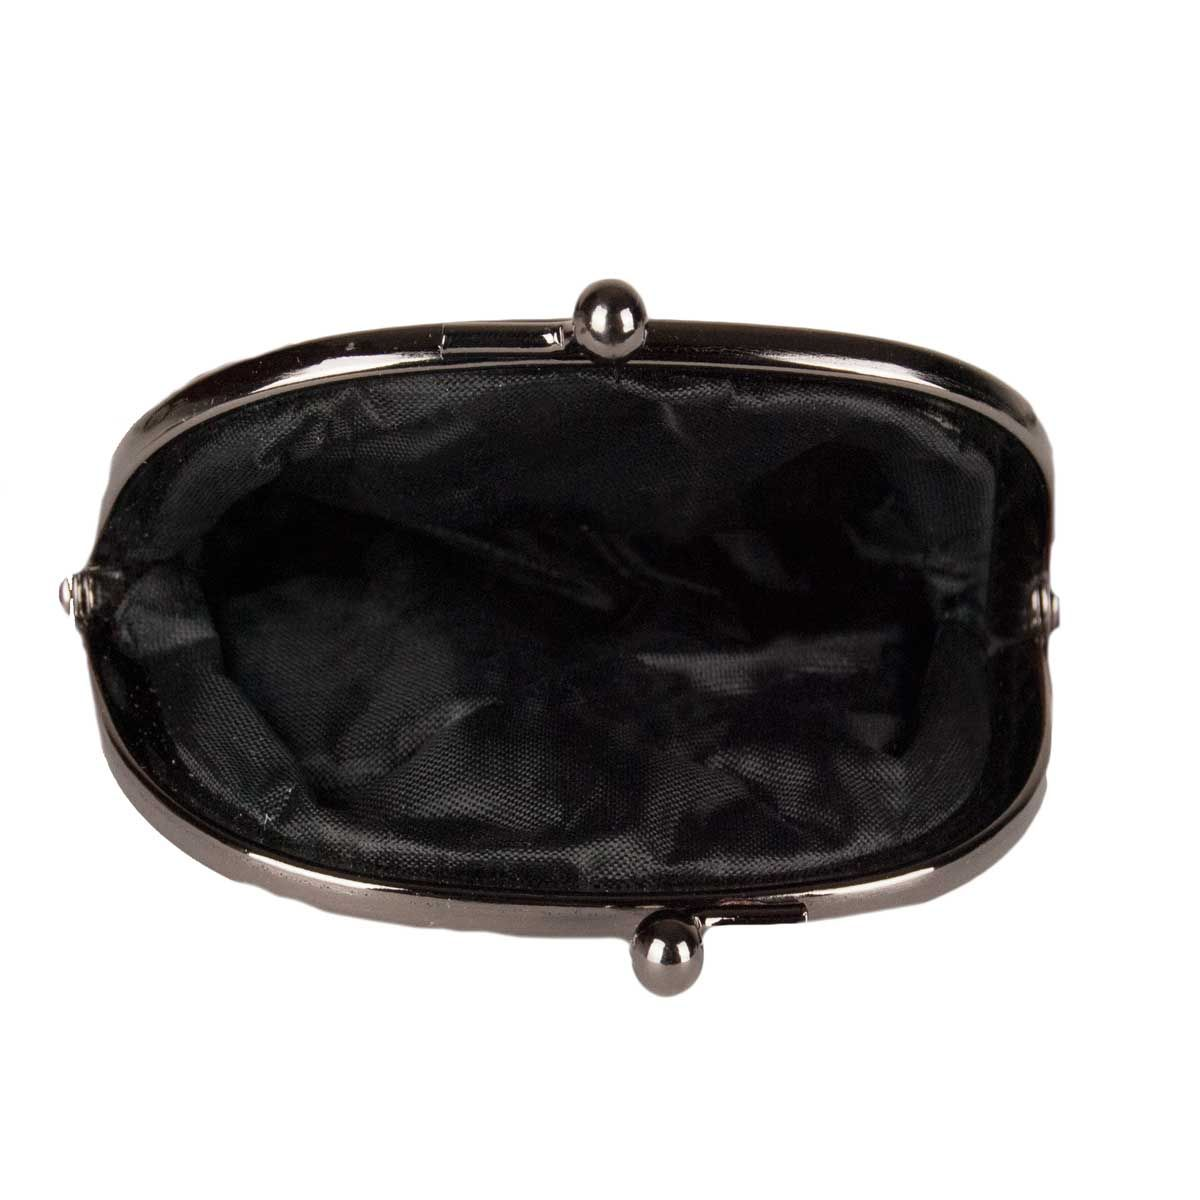 Montevita Leather Purse in Grey